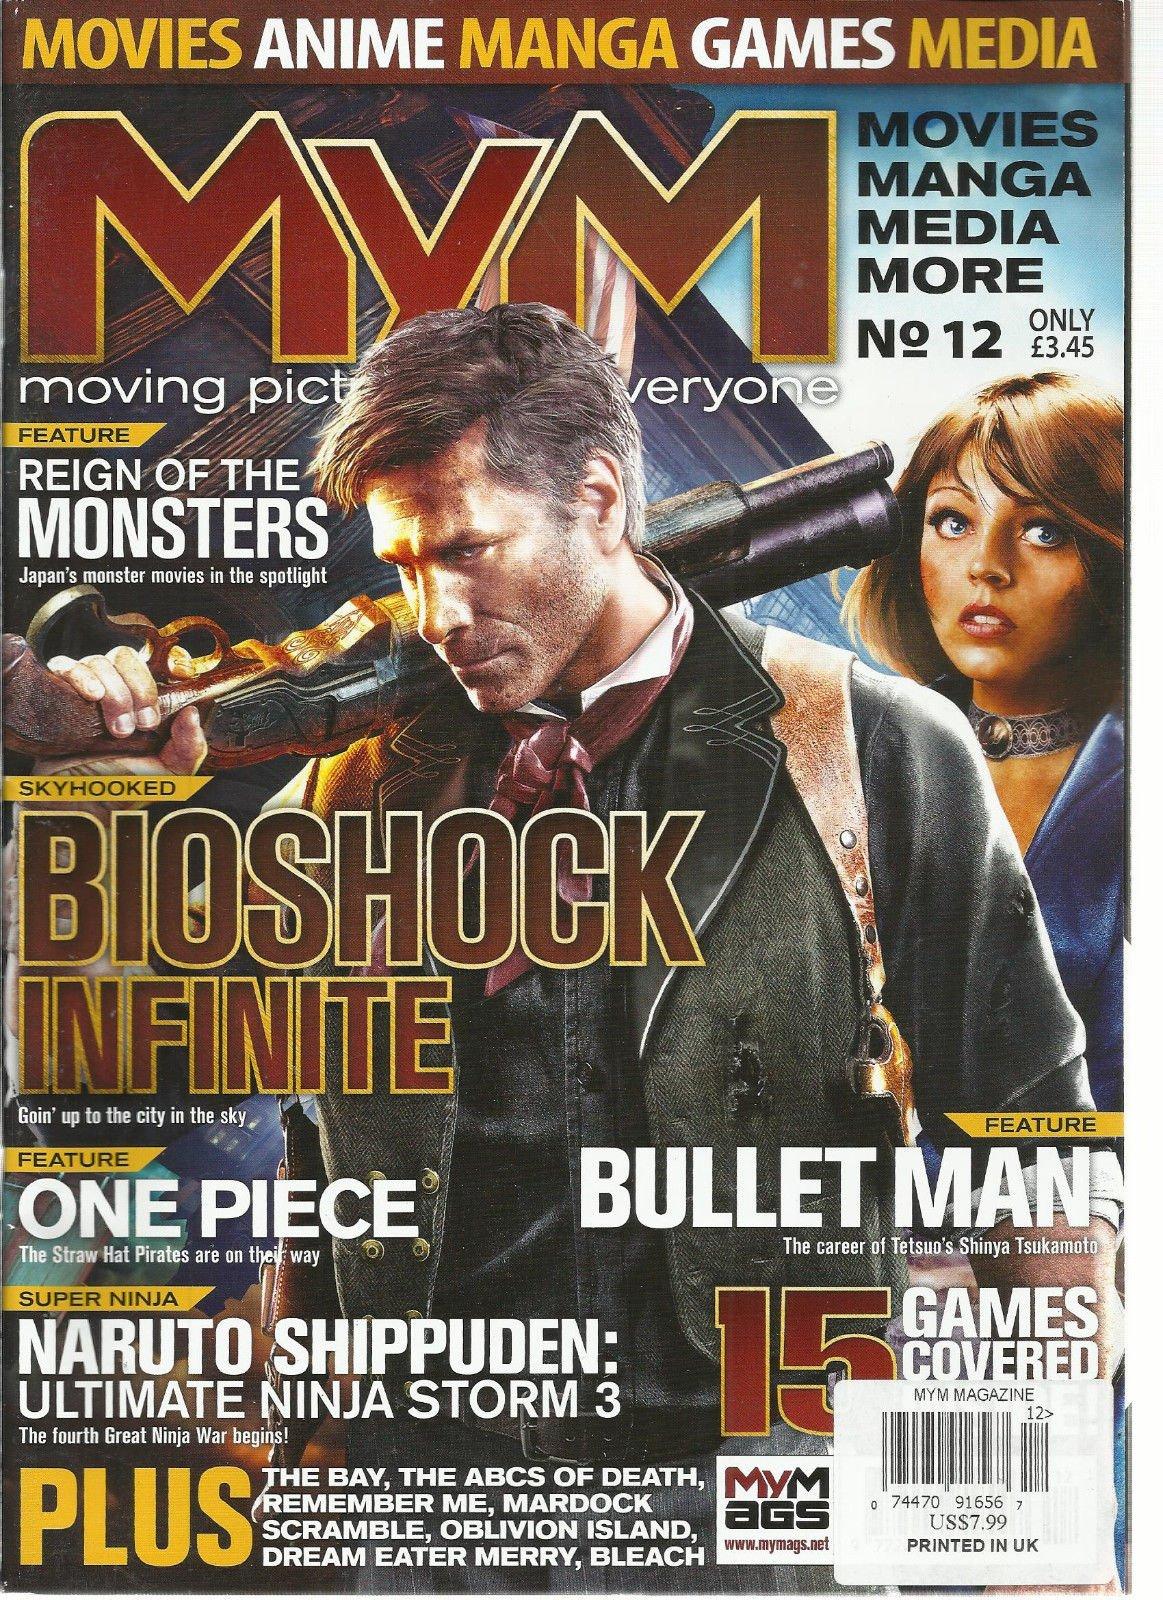 MYM MAGAZINE, 2013 NO. 12 PRINTED IN UK ( MOVIES ANIME MANGA GAMES MEDIA )